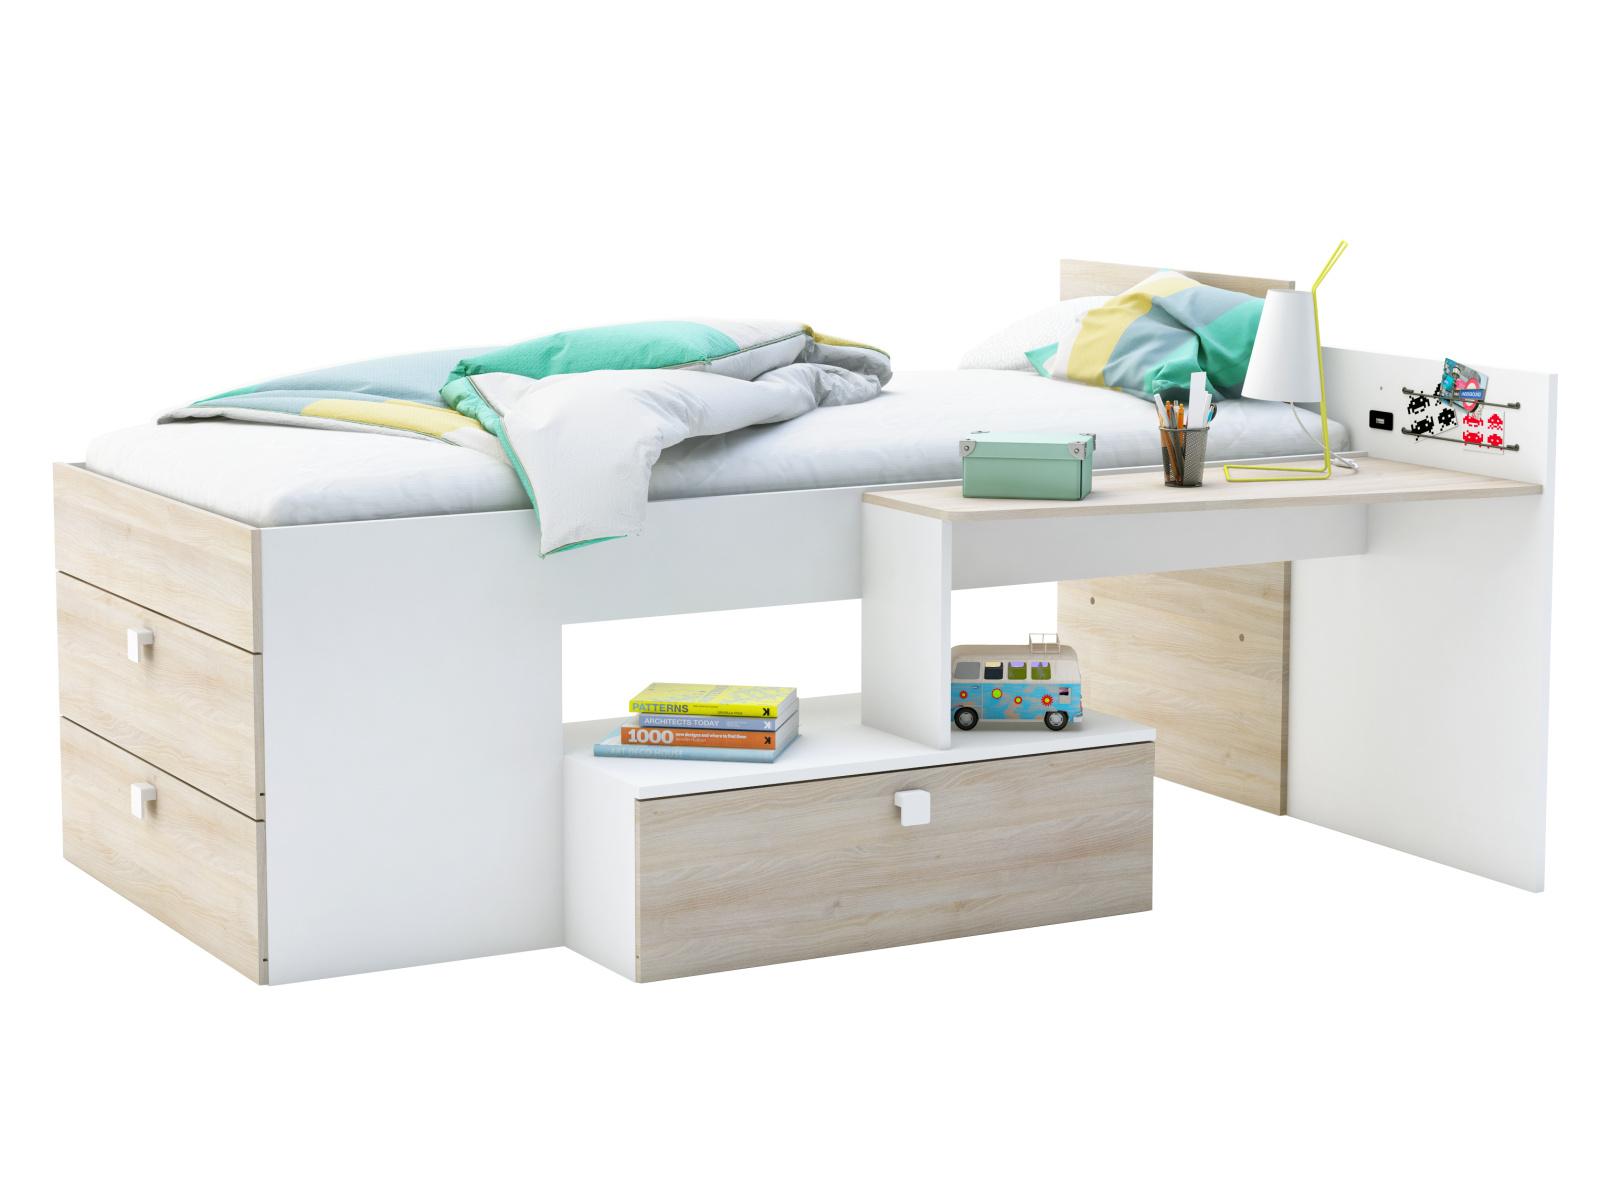 DEMEYERE MOWE postel 90x190 cm, bílá/akát